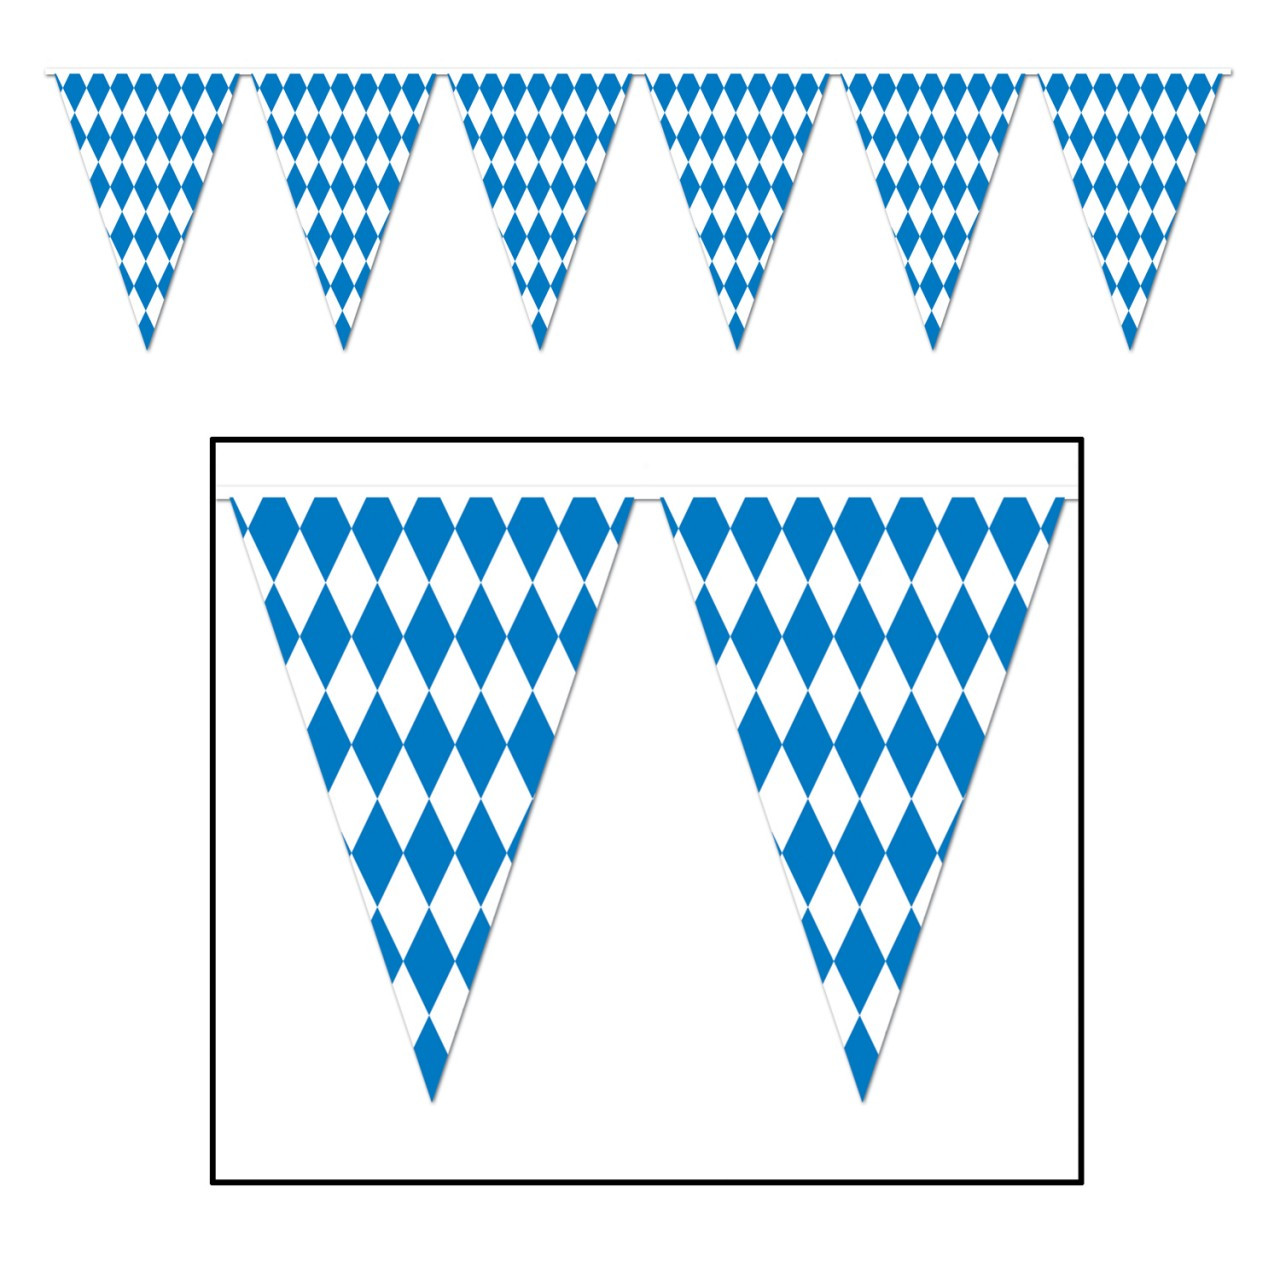 Oktoberfest Party Pennant Banner Large